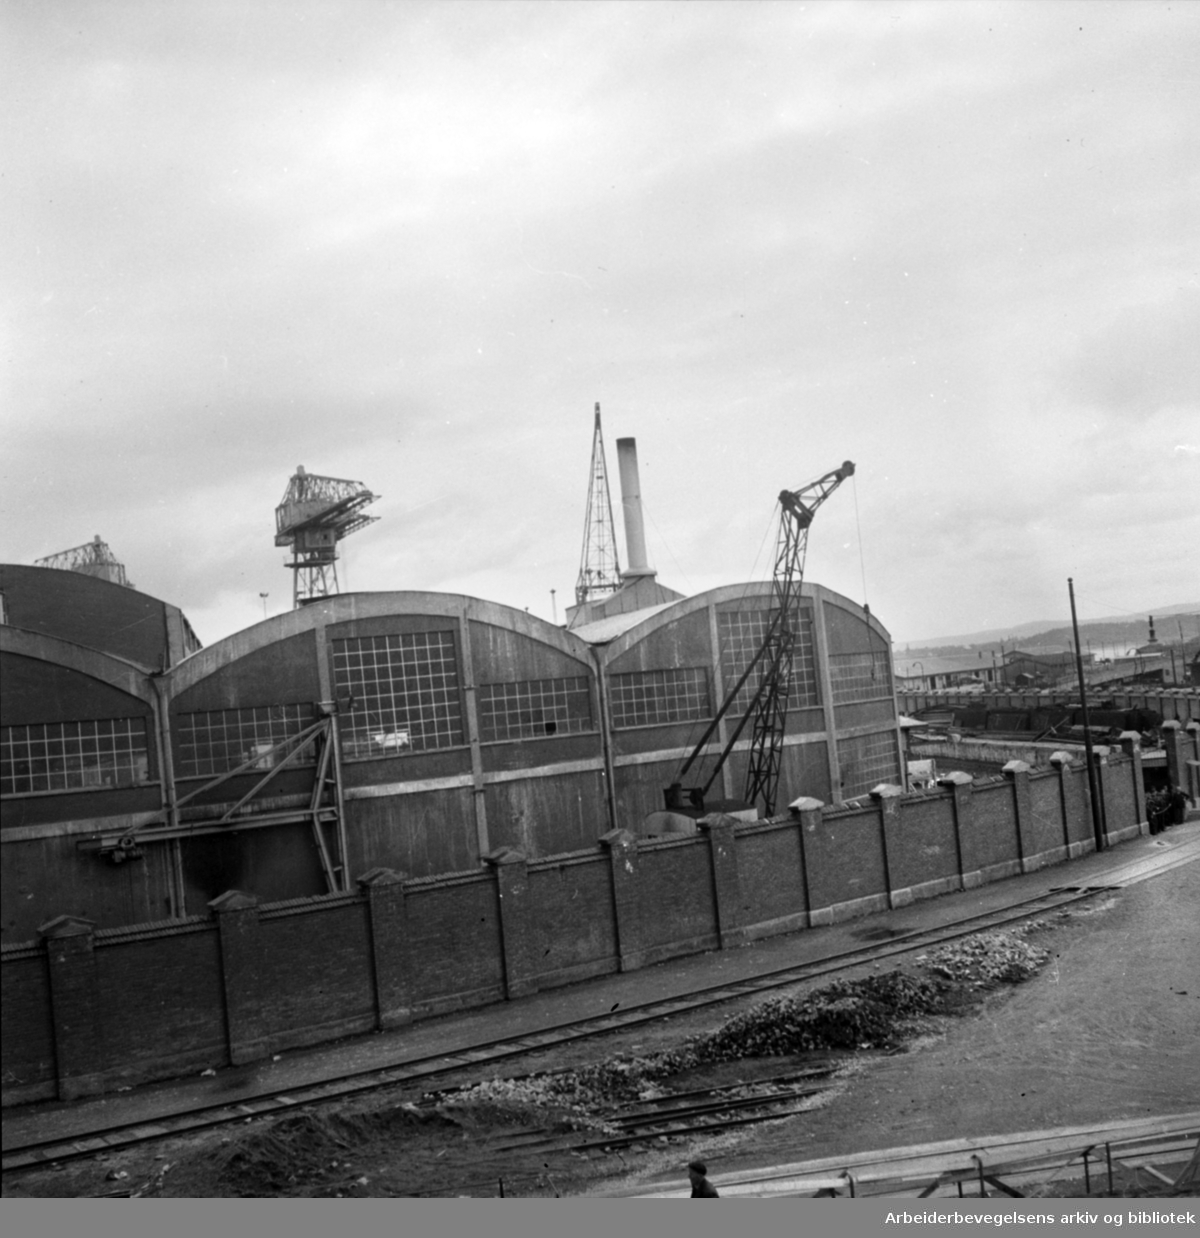 Akers Mekaniske Verksted. 1948.